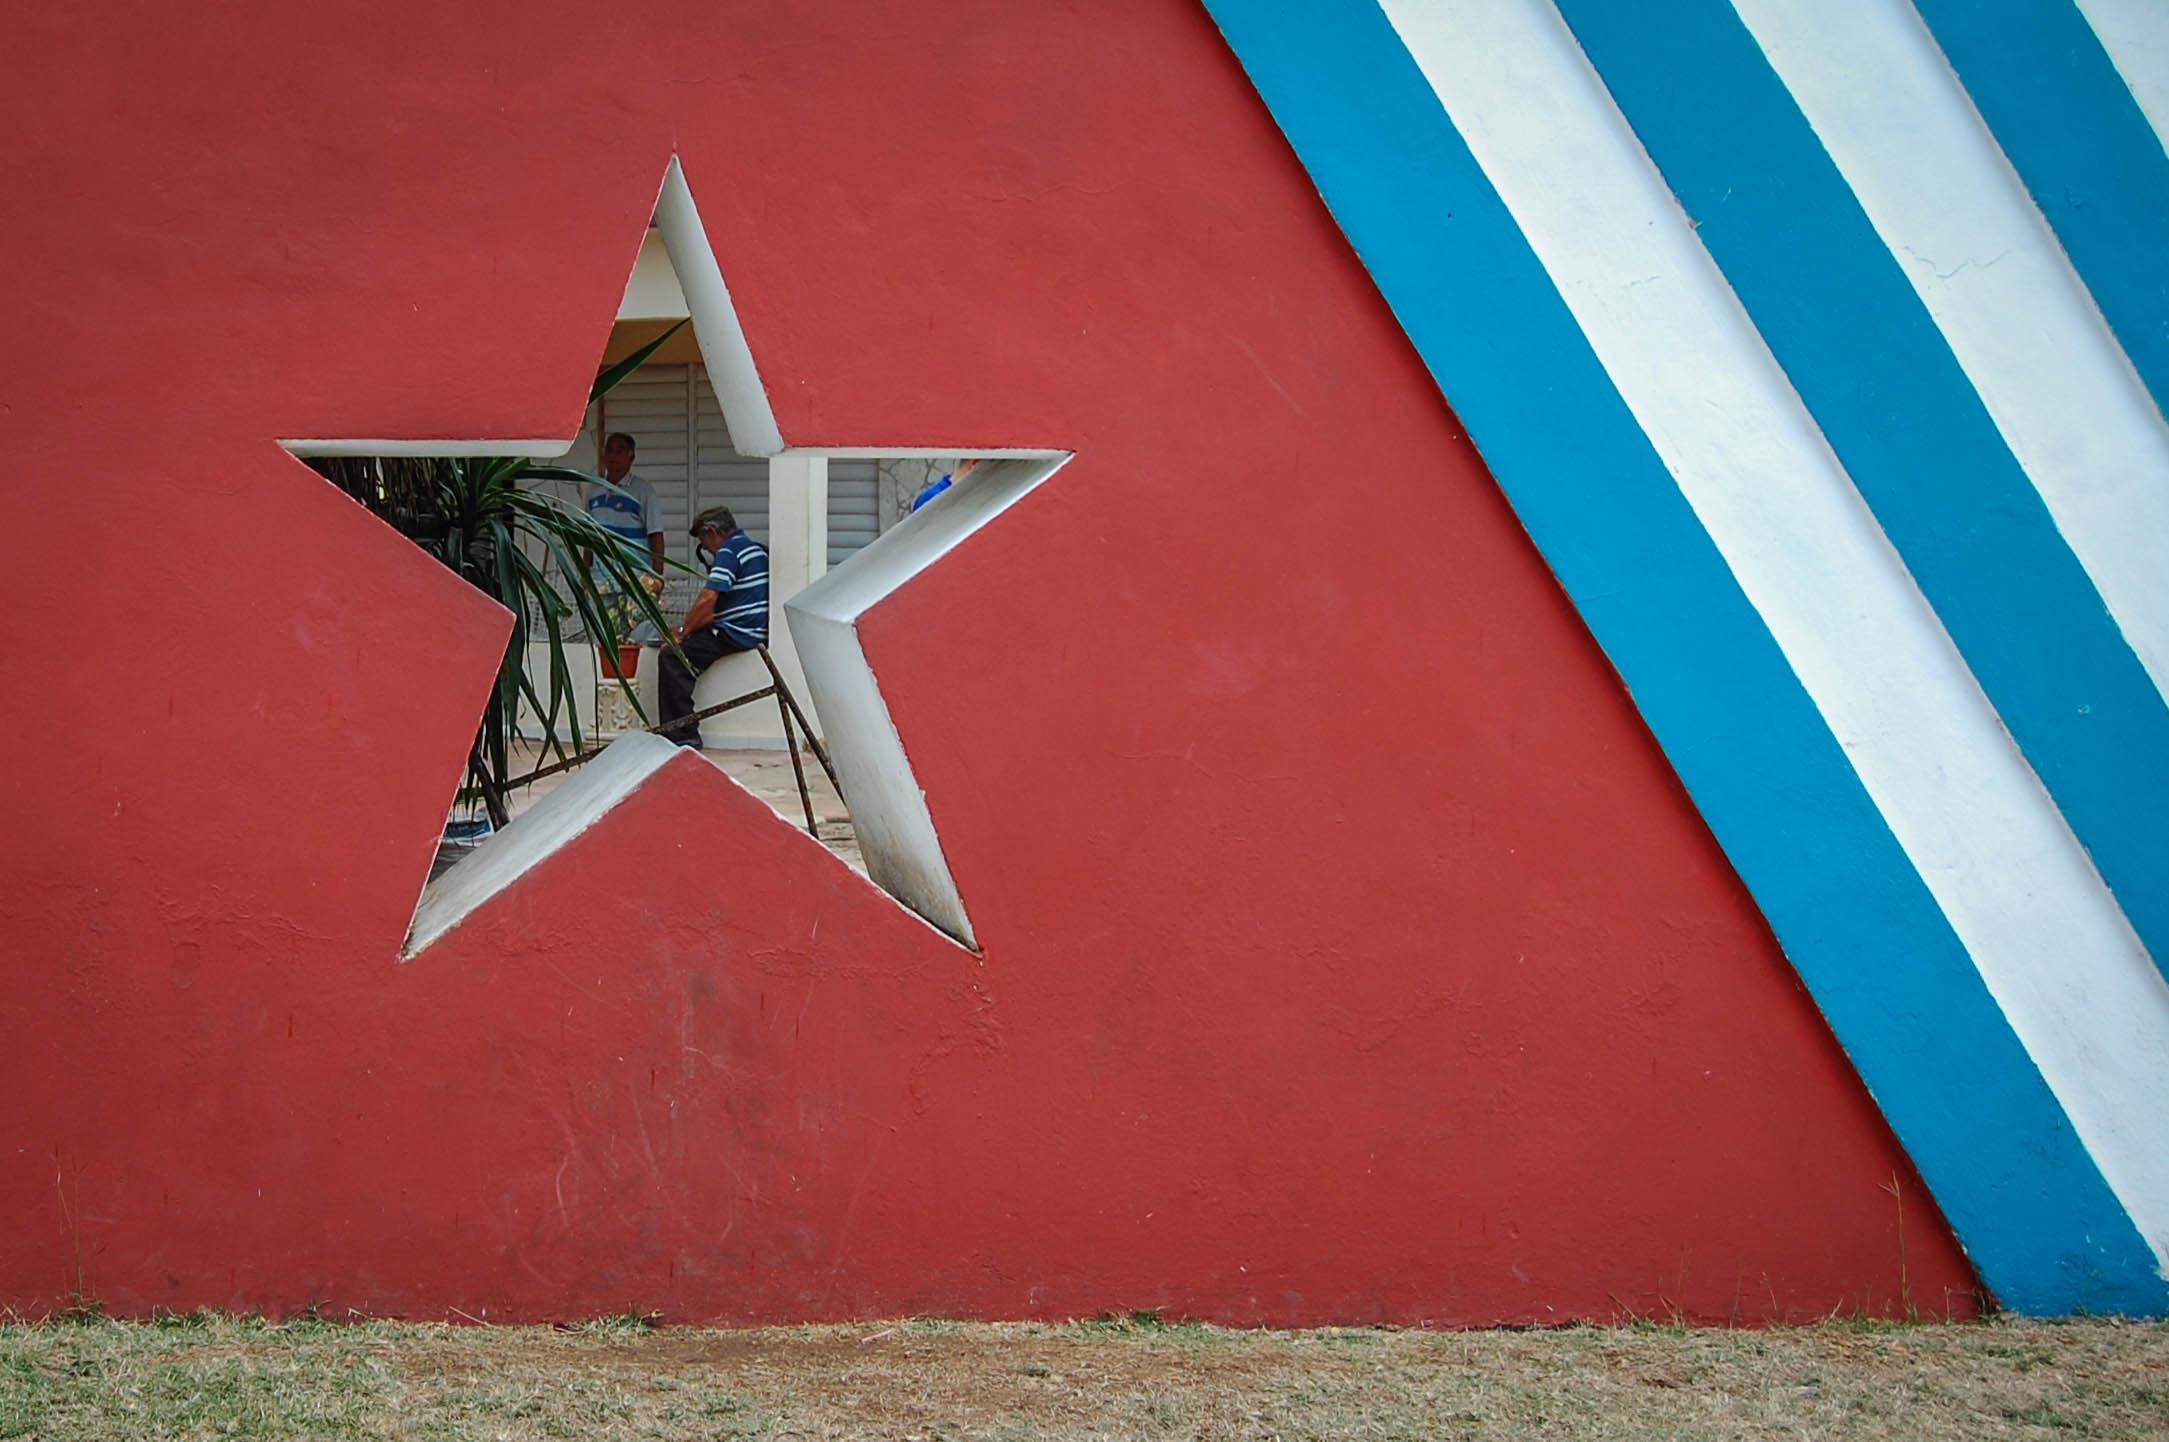 Seeing stars Varadero, Cuba Nikon D40, 18-55mm F3.5 3.13